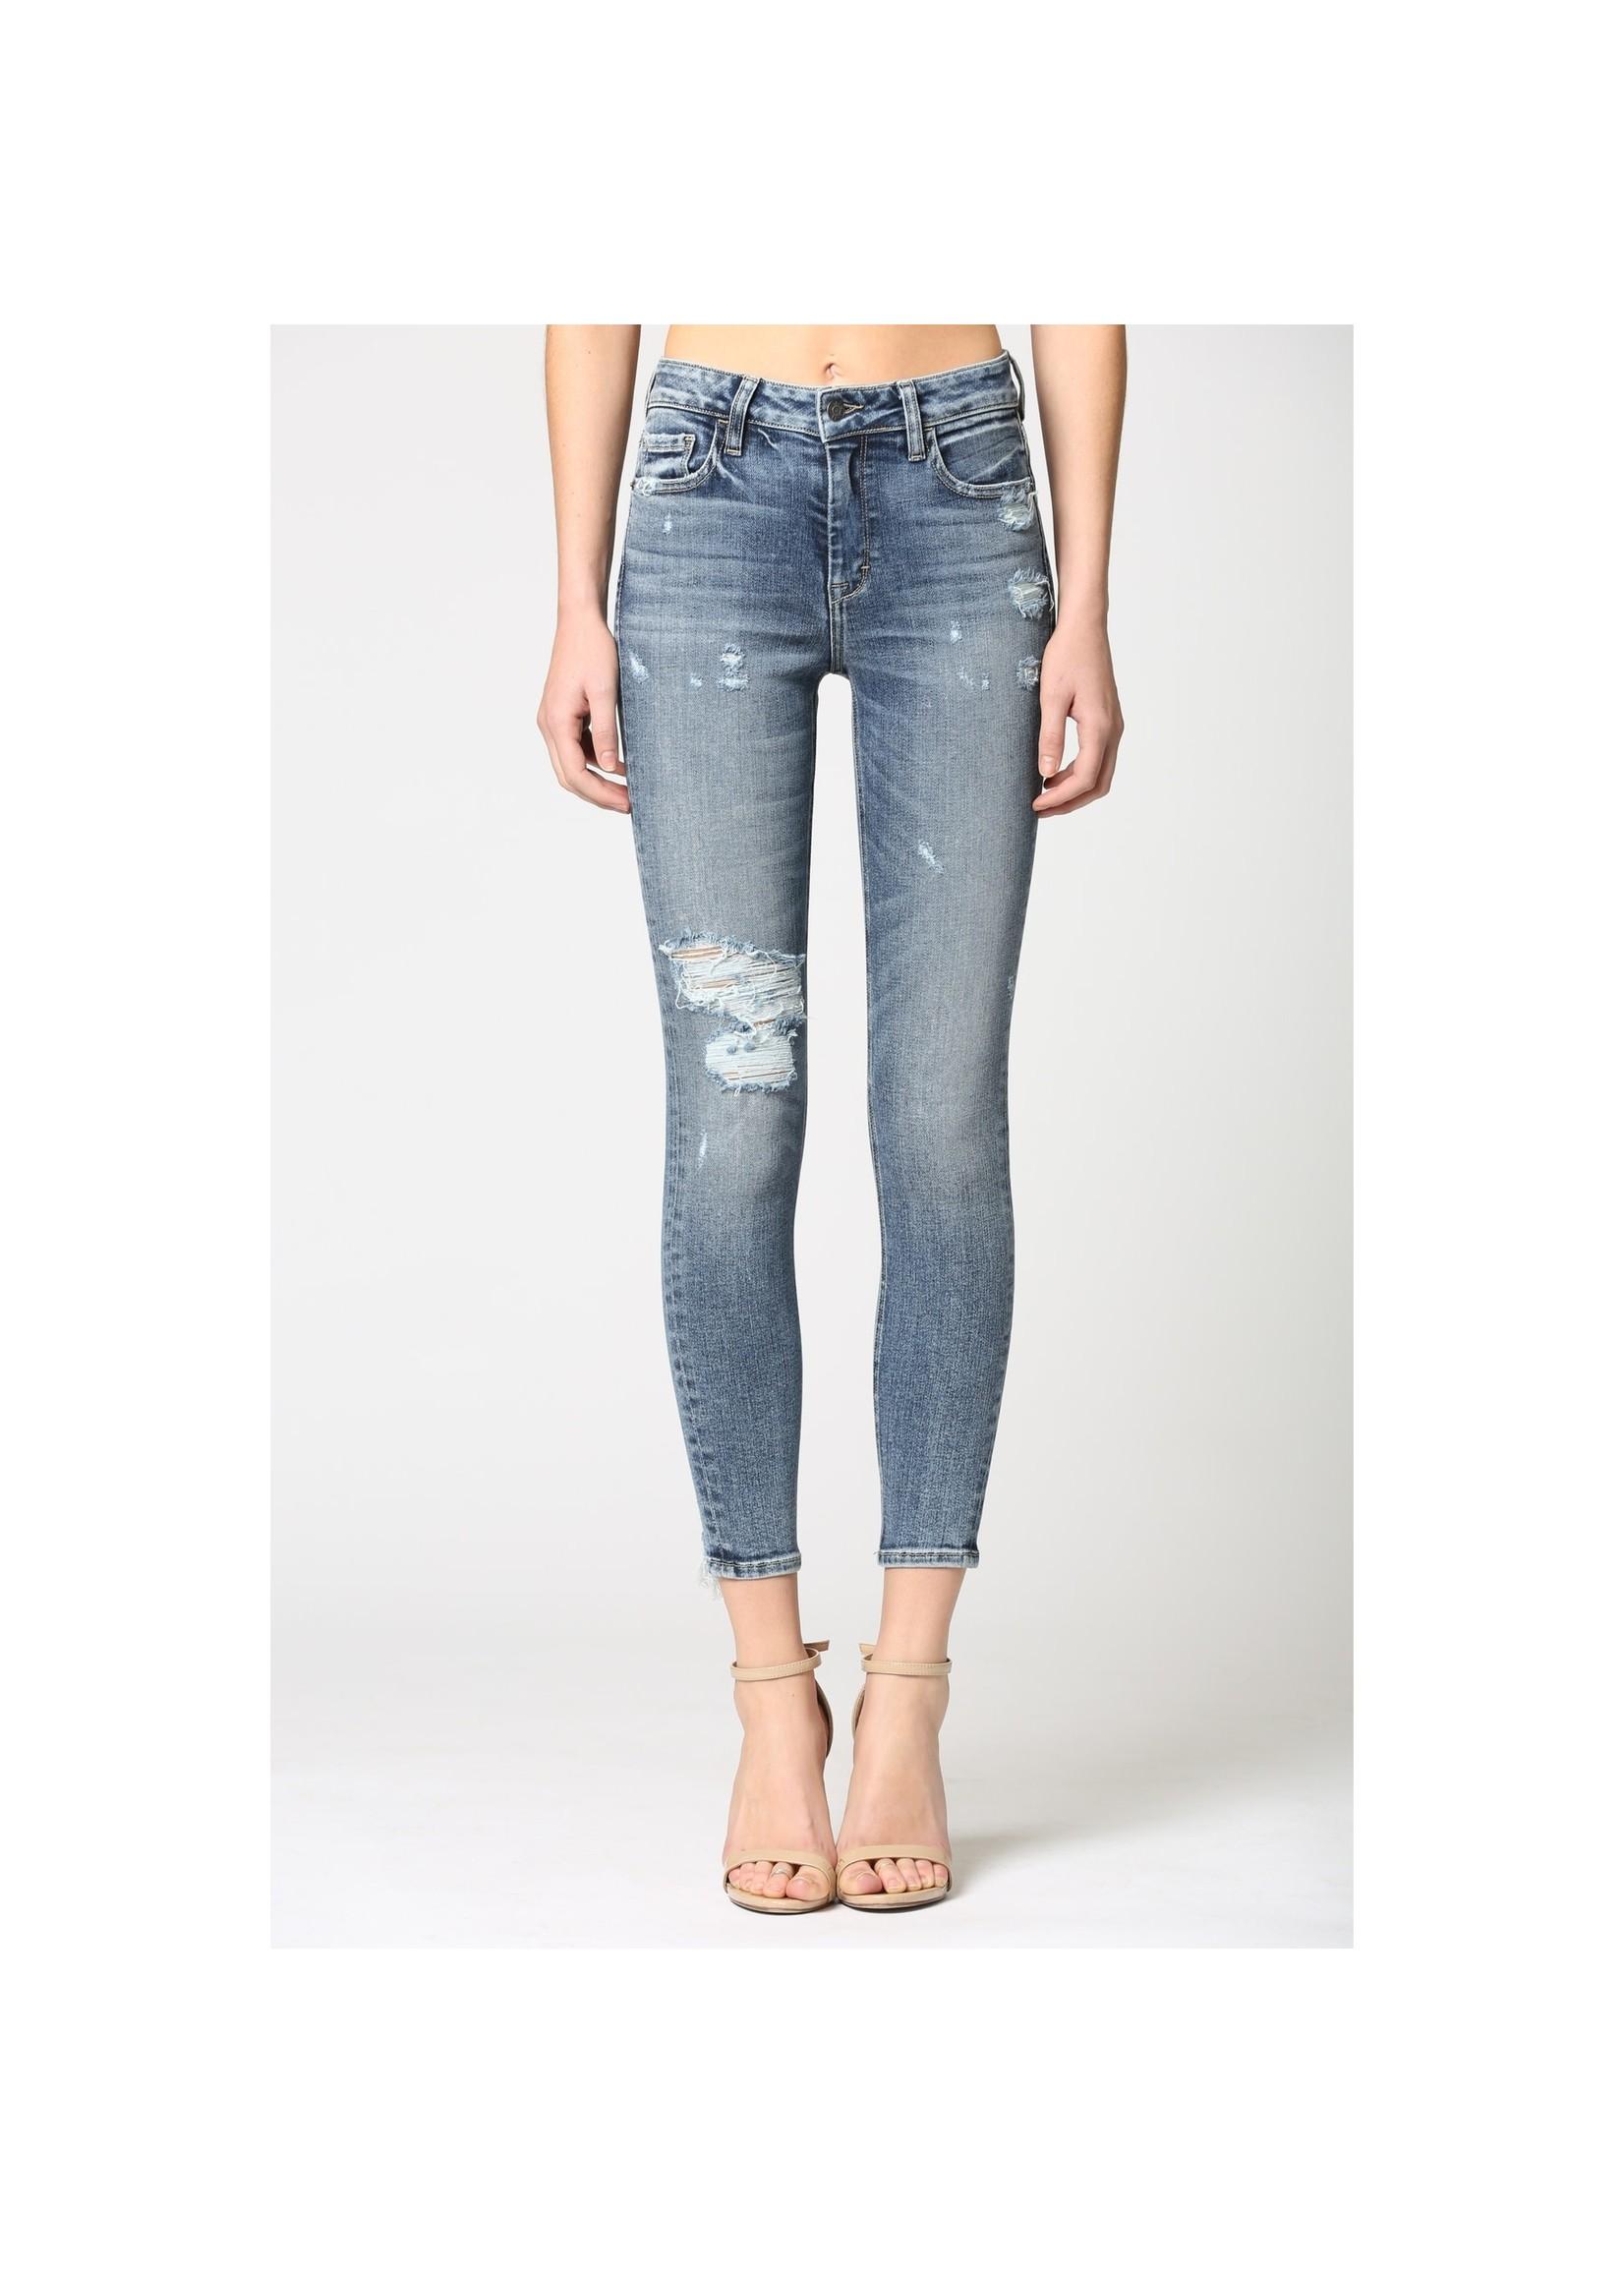 Hidden Jean Medium Wash Distressed Skinny Jeans